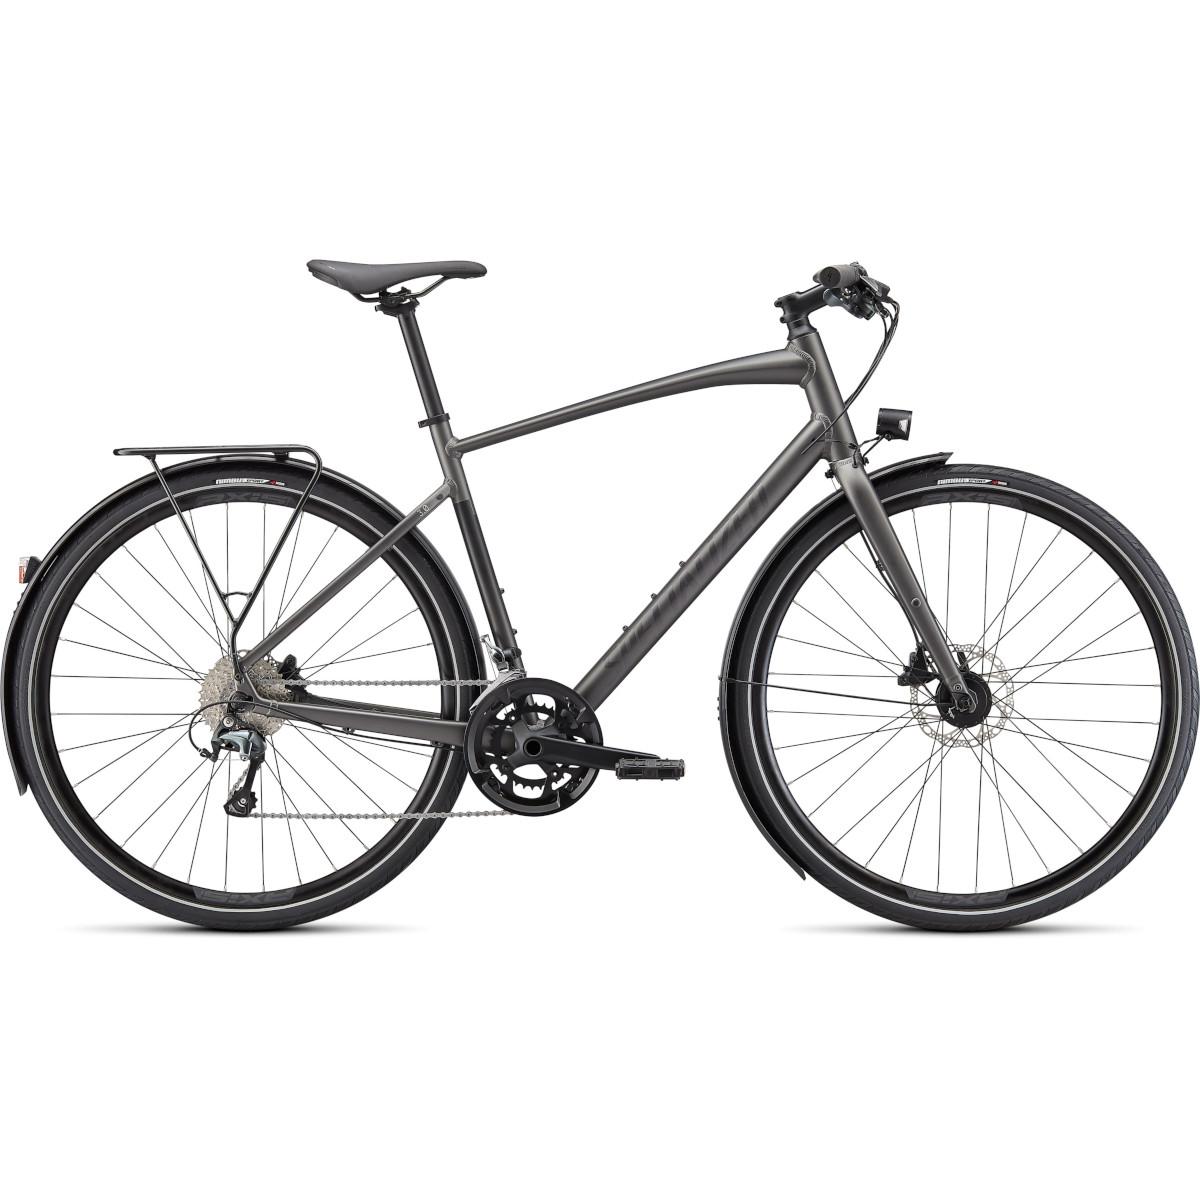 Specialized SIRRUS 3.0 EQ - Bicicleta de trekking - 2021 - smoke / black reflective